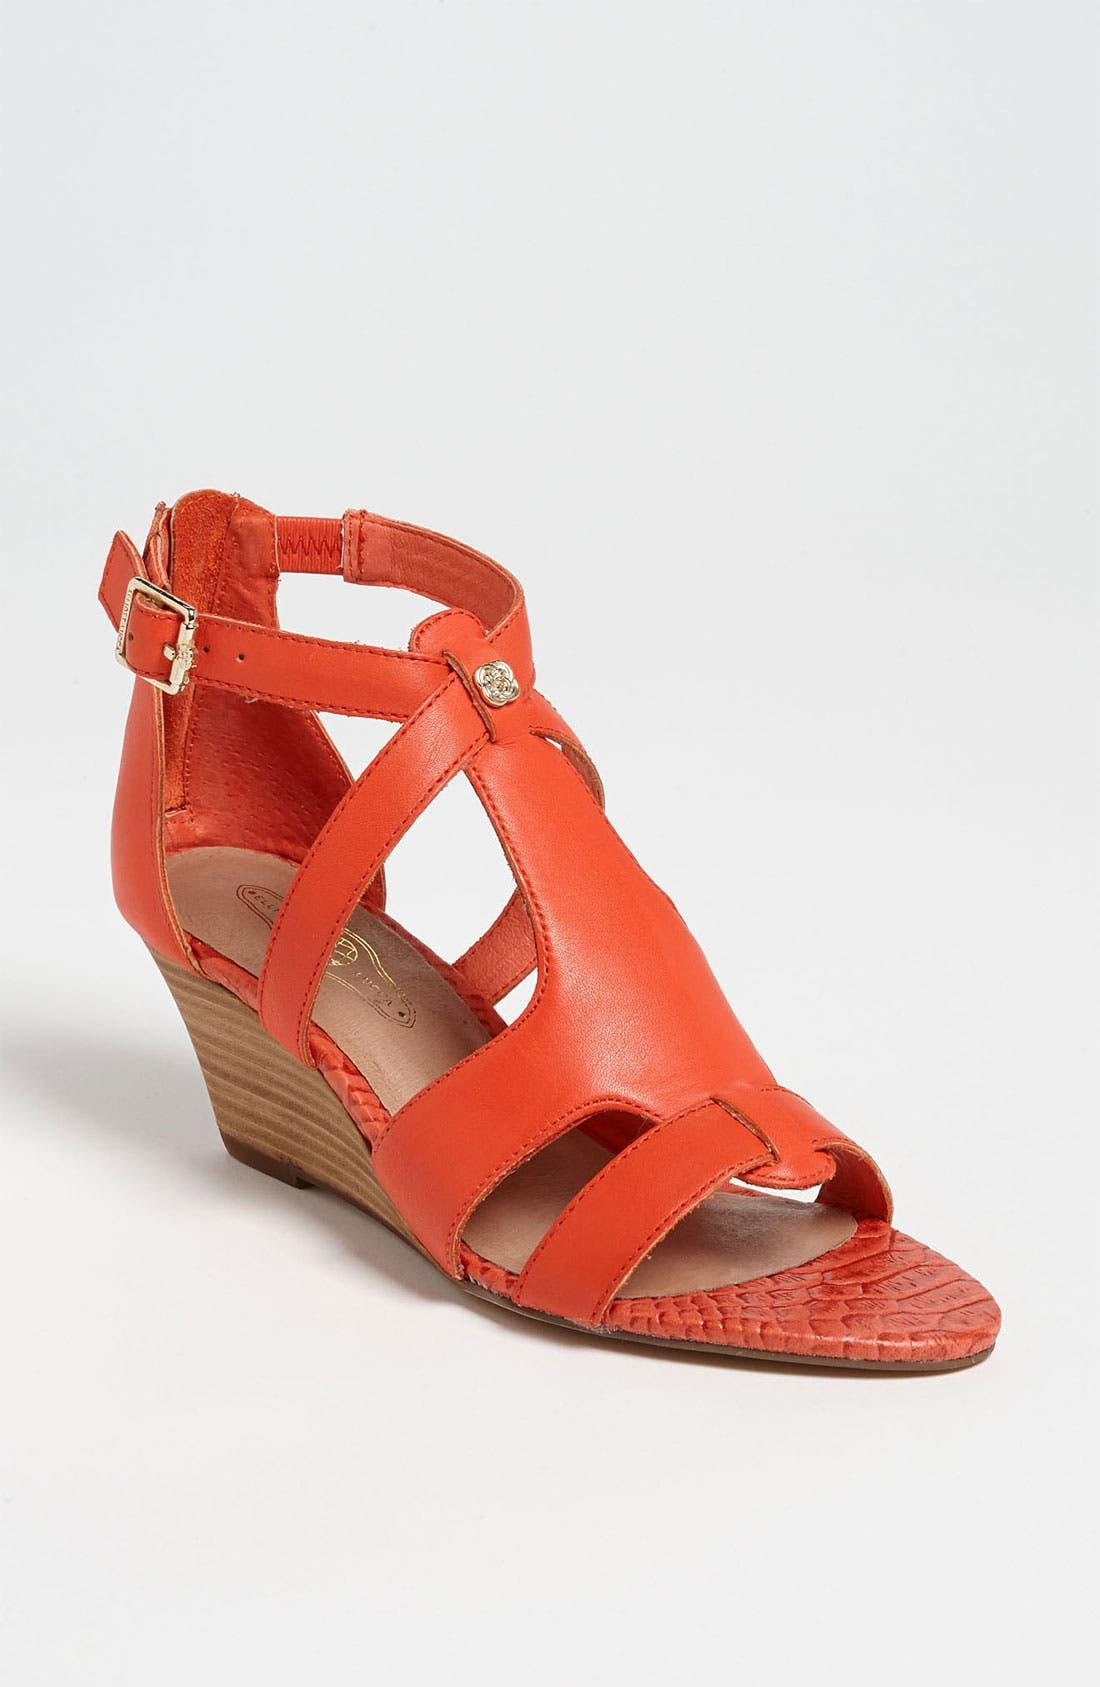 Alternate Image 1 Selected - Elliott Lucca 'Lorena' Sandal